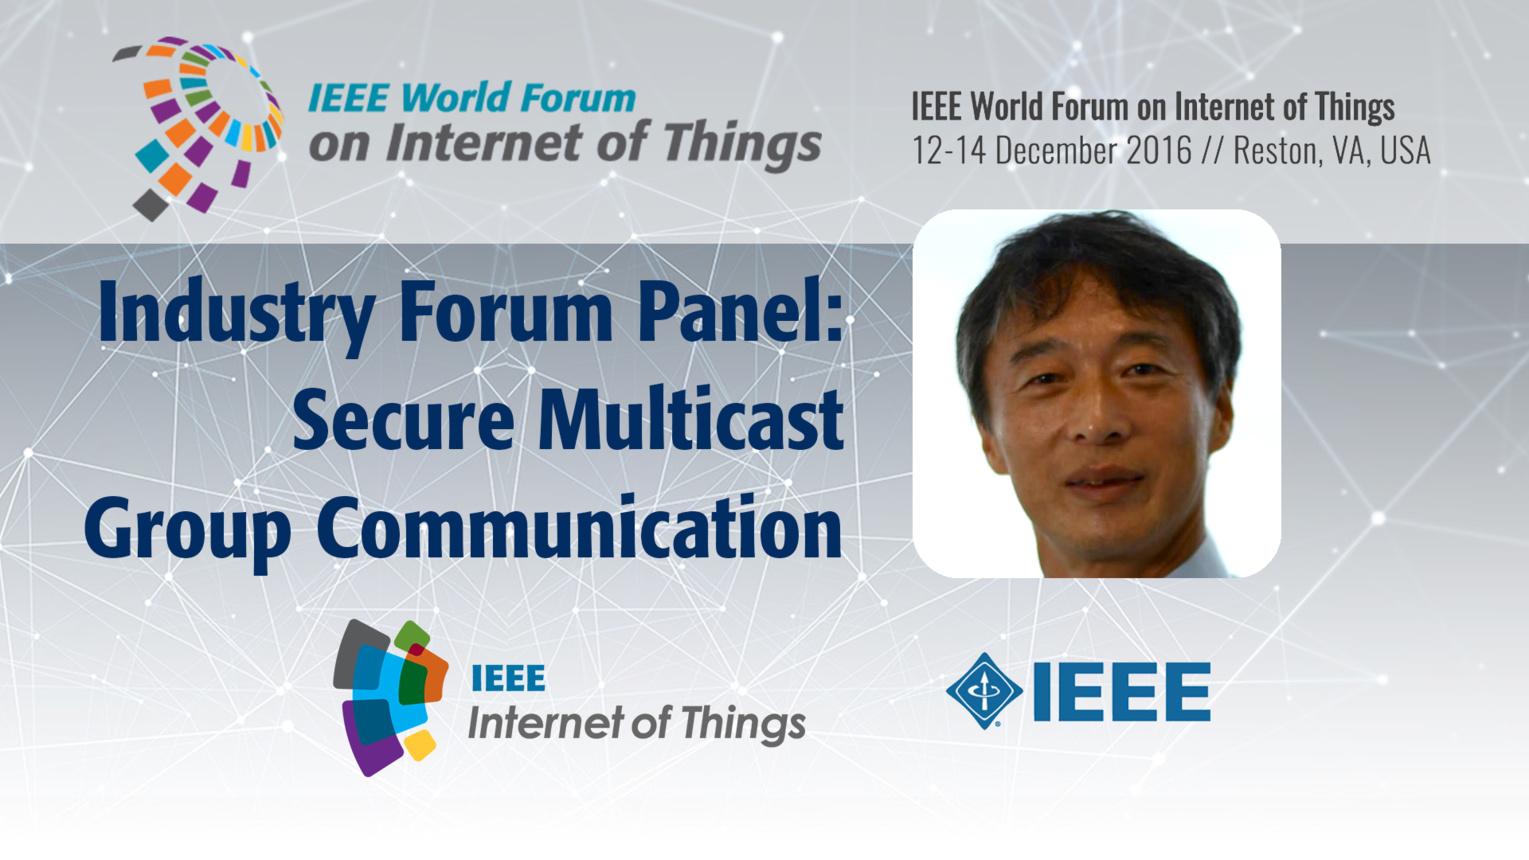 Yoshihiro Ohba: Secure Multicast Group Communication in ECHONET-Lite - Industry Forum Panel: WF IoT 2016